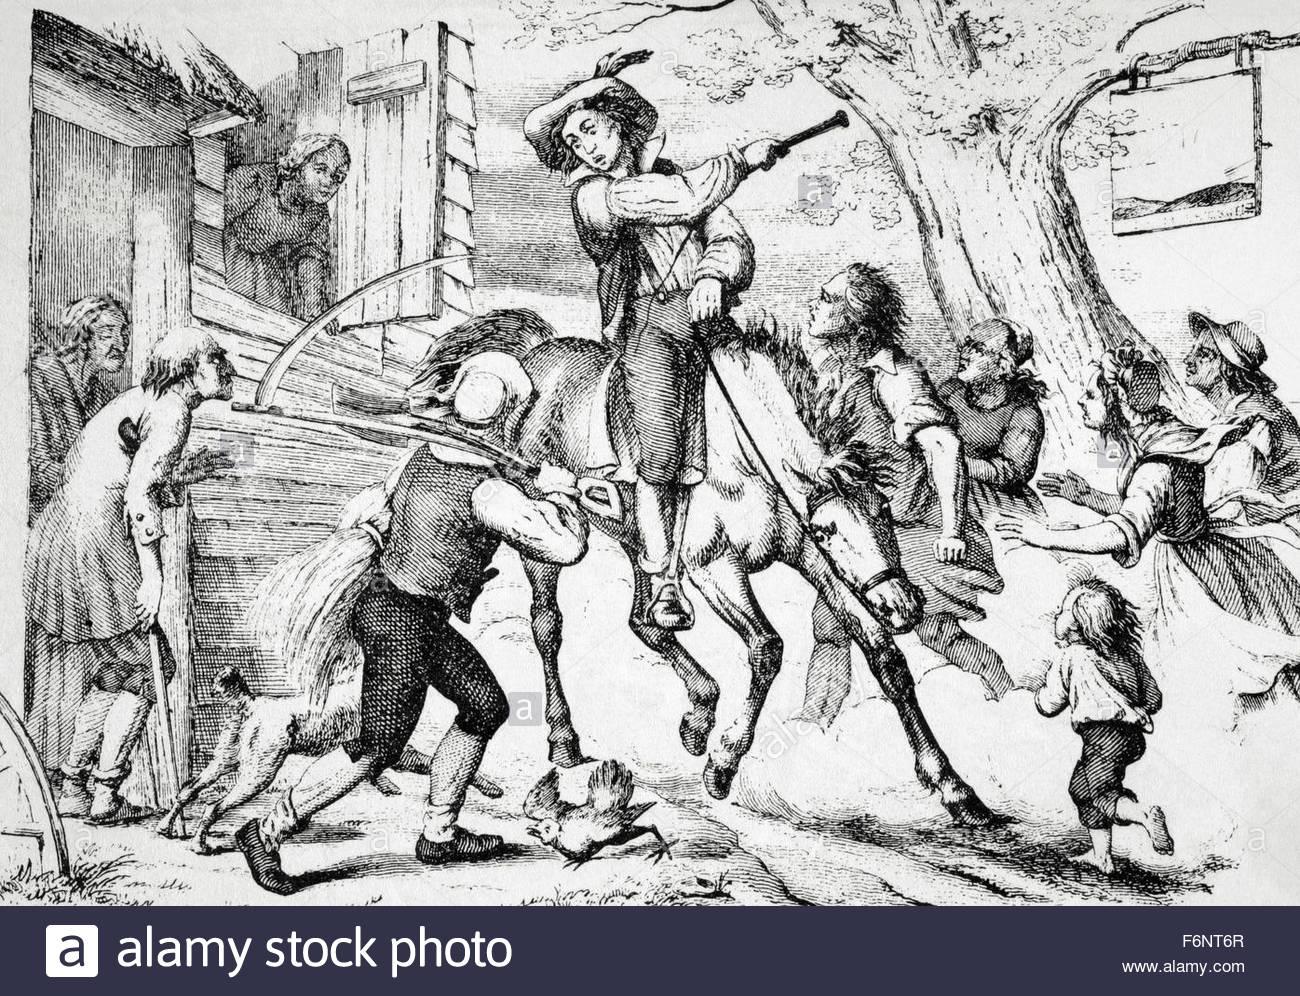 1300x996 American Revolutionary War (1775 1783). The Citizens Of New York